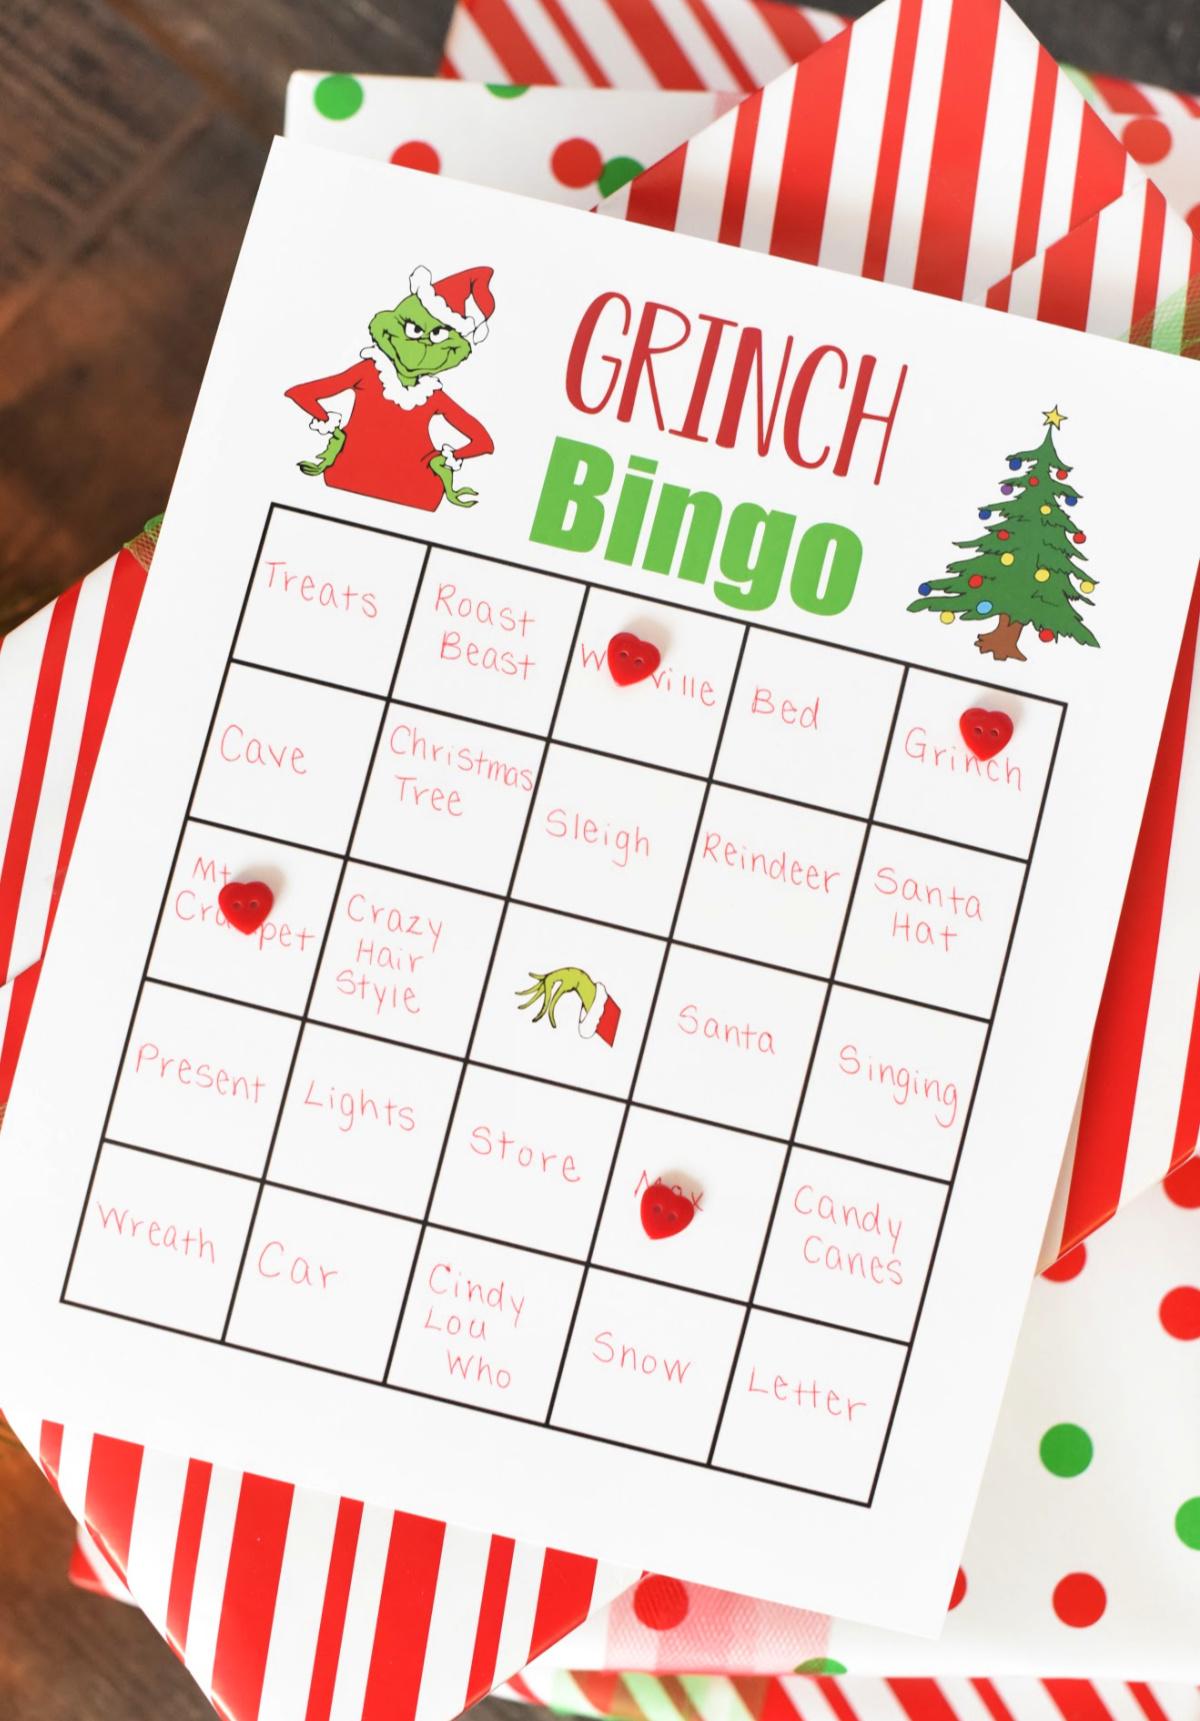 Grinch bingo game